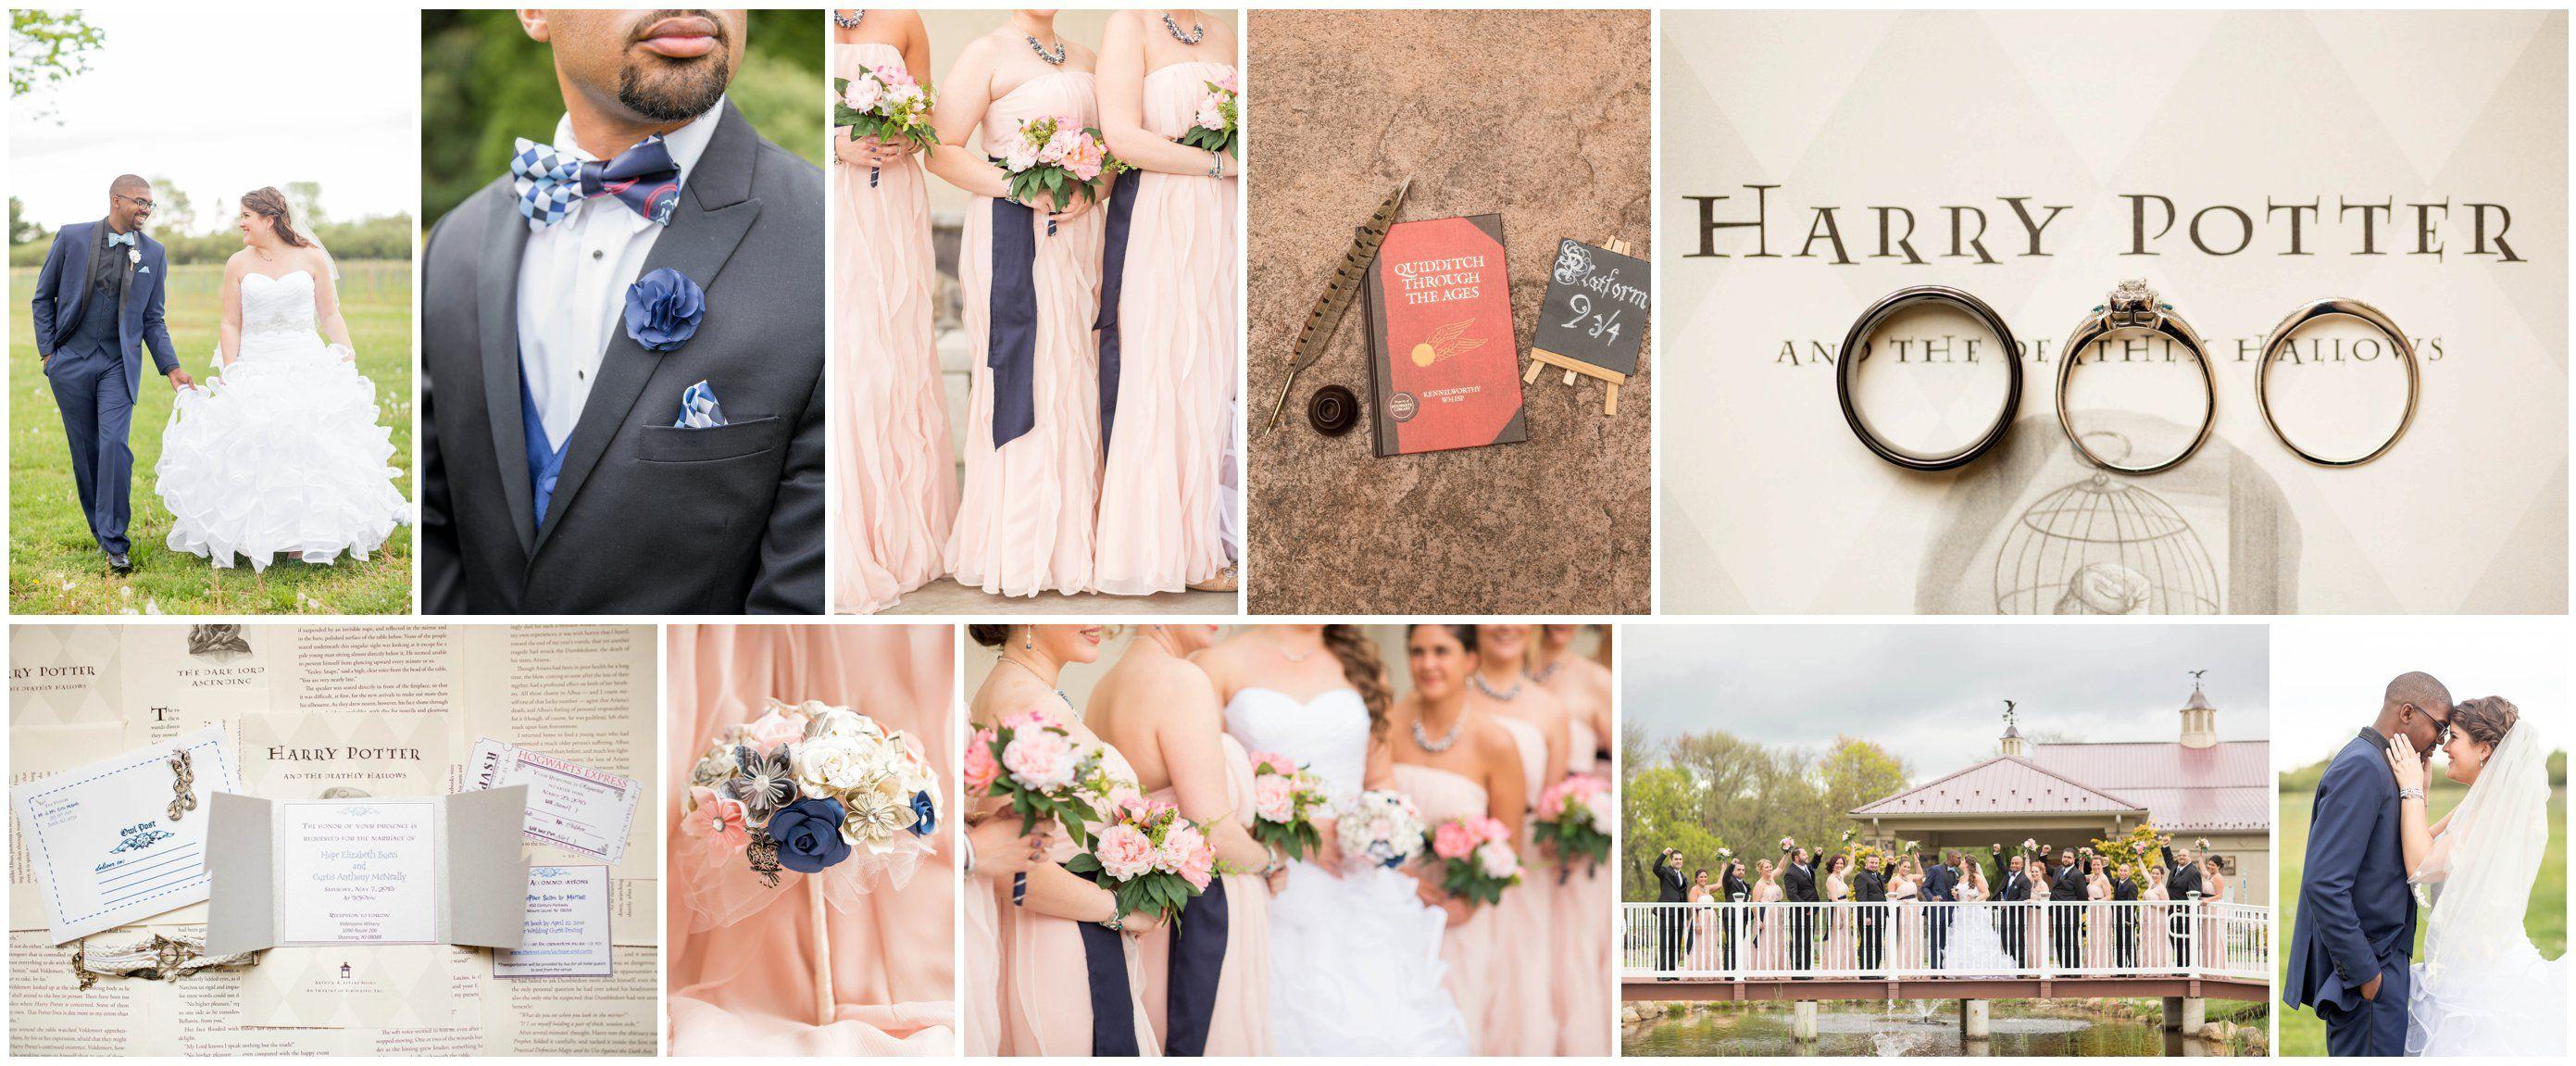 Harry potter wedding dress  HARRY POTTER WEDDING kaitlinnoelphotographyblogvalenzano